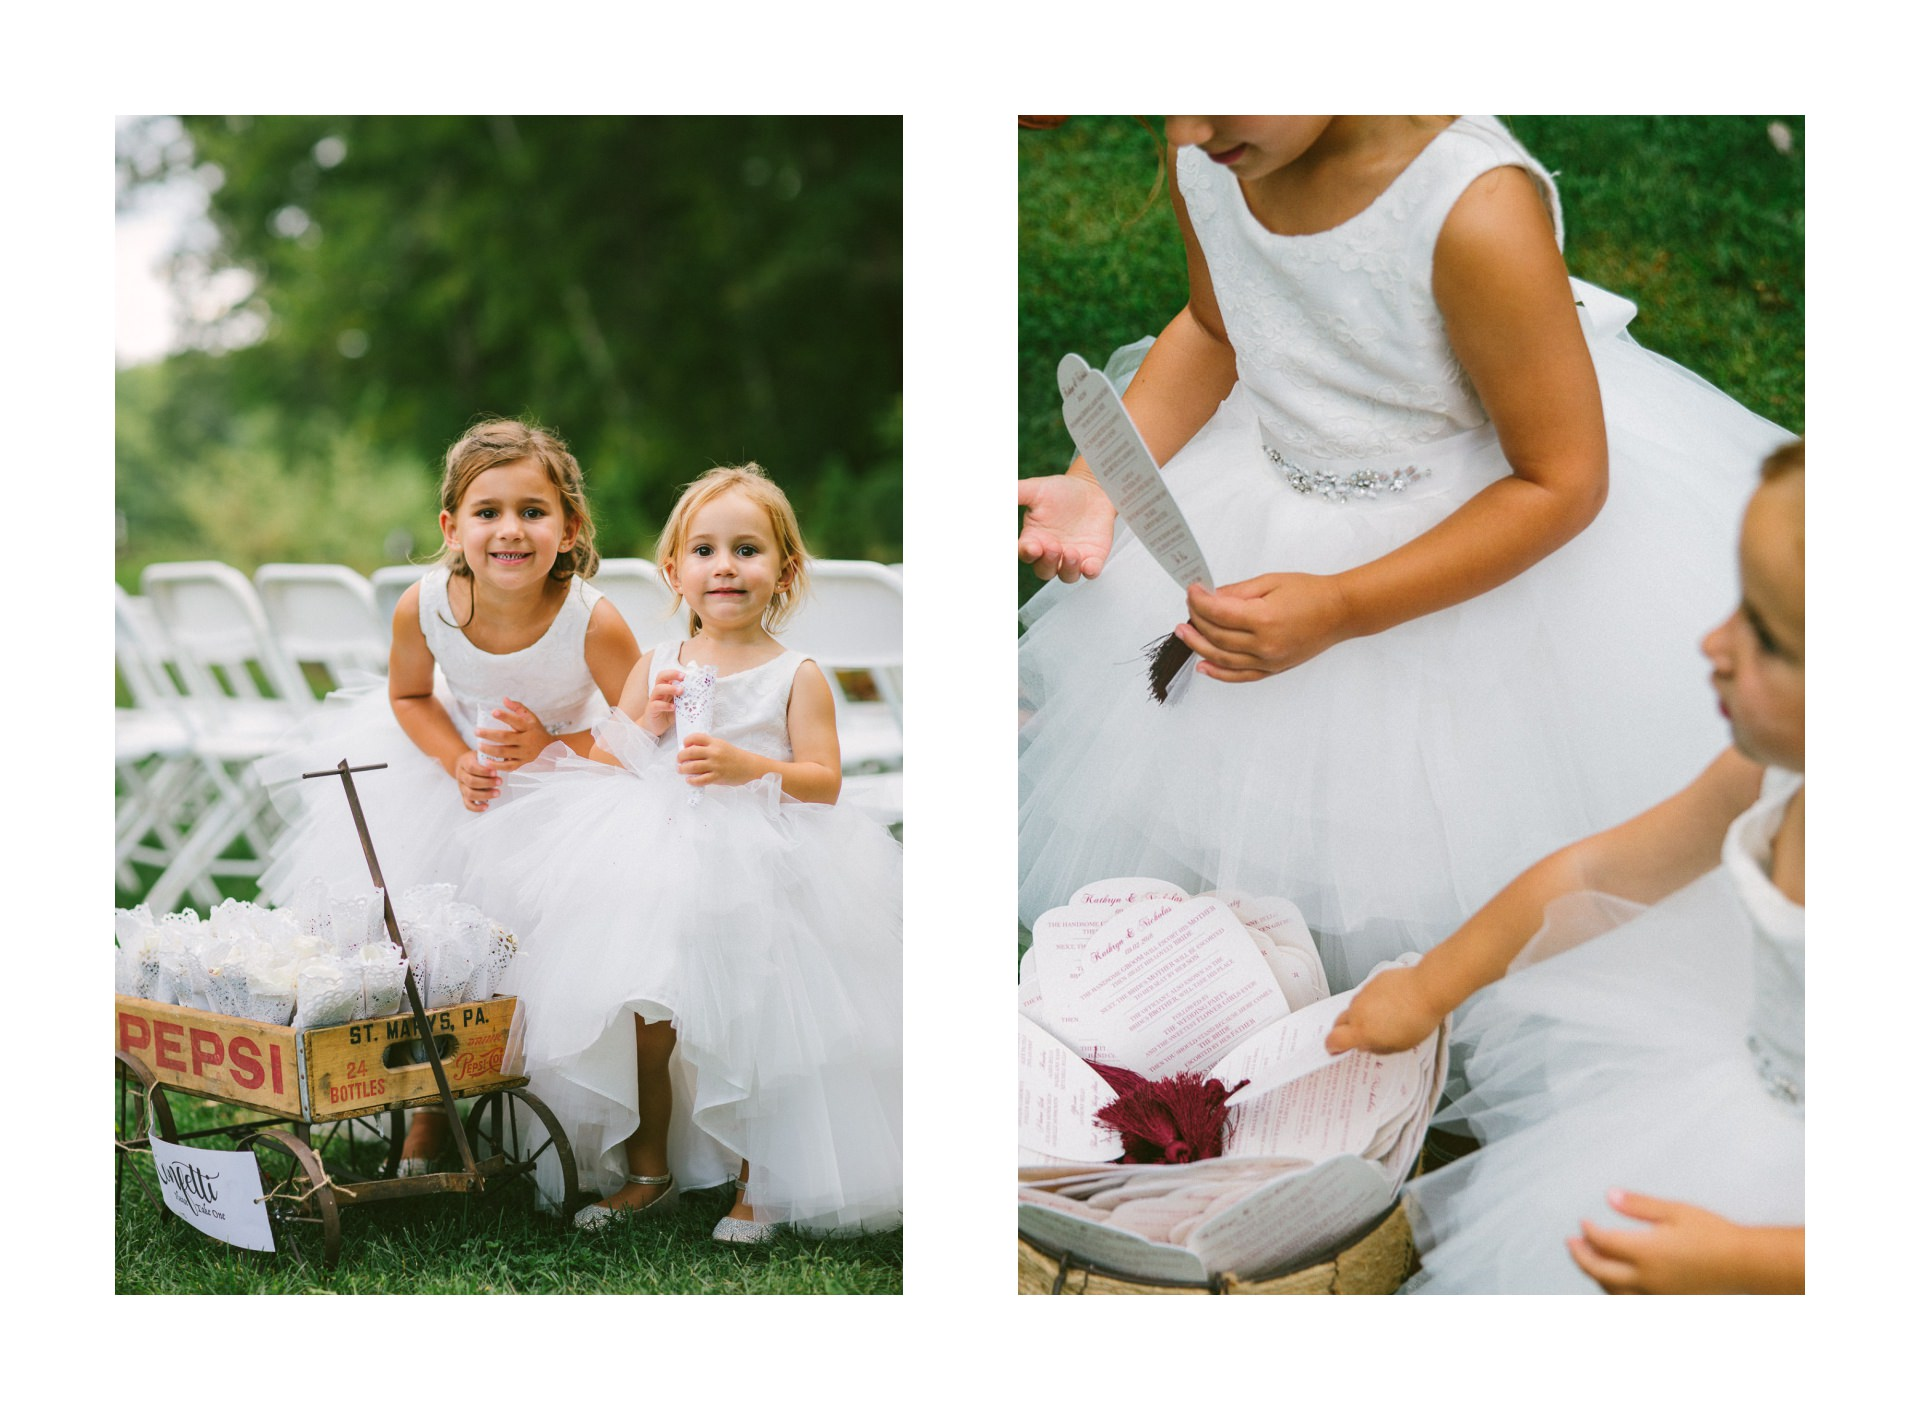 Meadow Ridge Farm Wedding Photos in Windsor 2 13.jpg